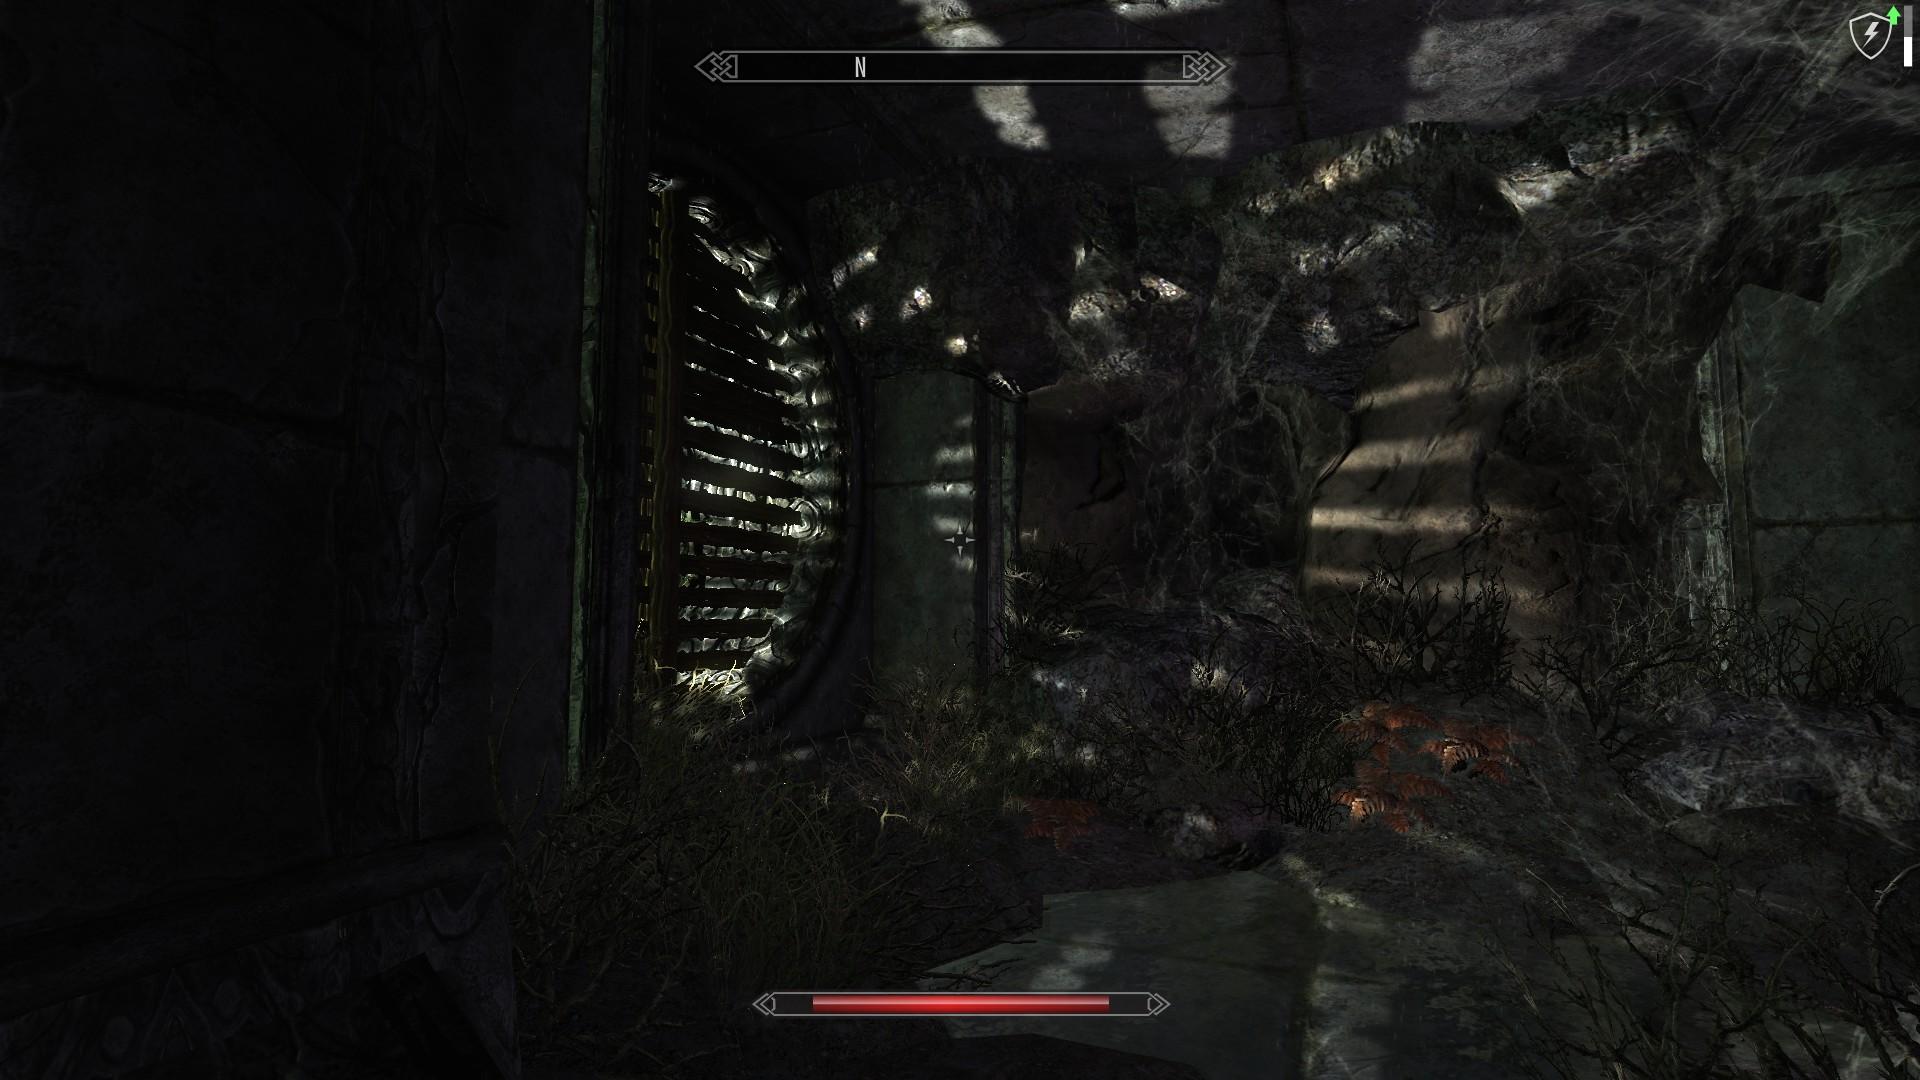 прогулки - Elder Scrolls 5: Skyrim, the